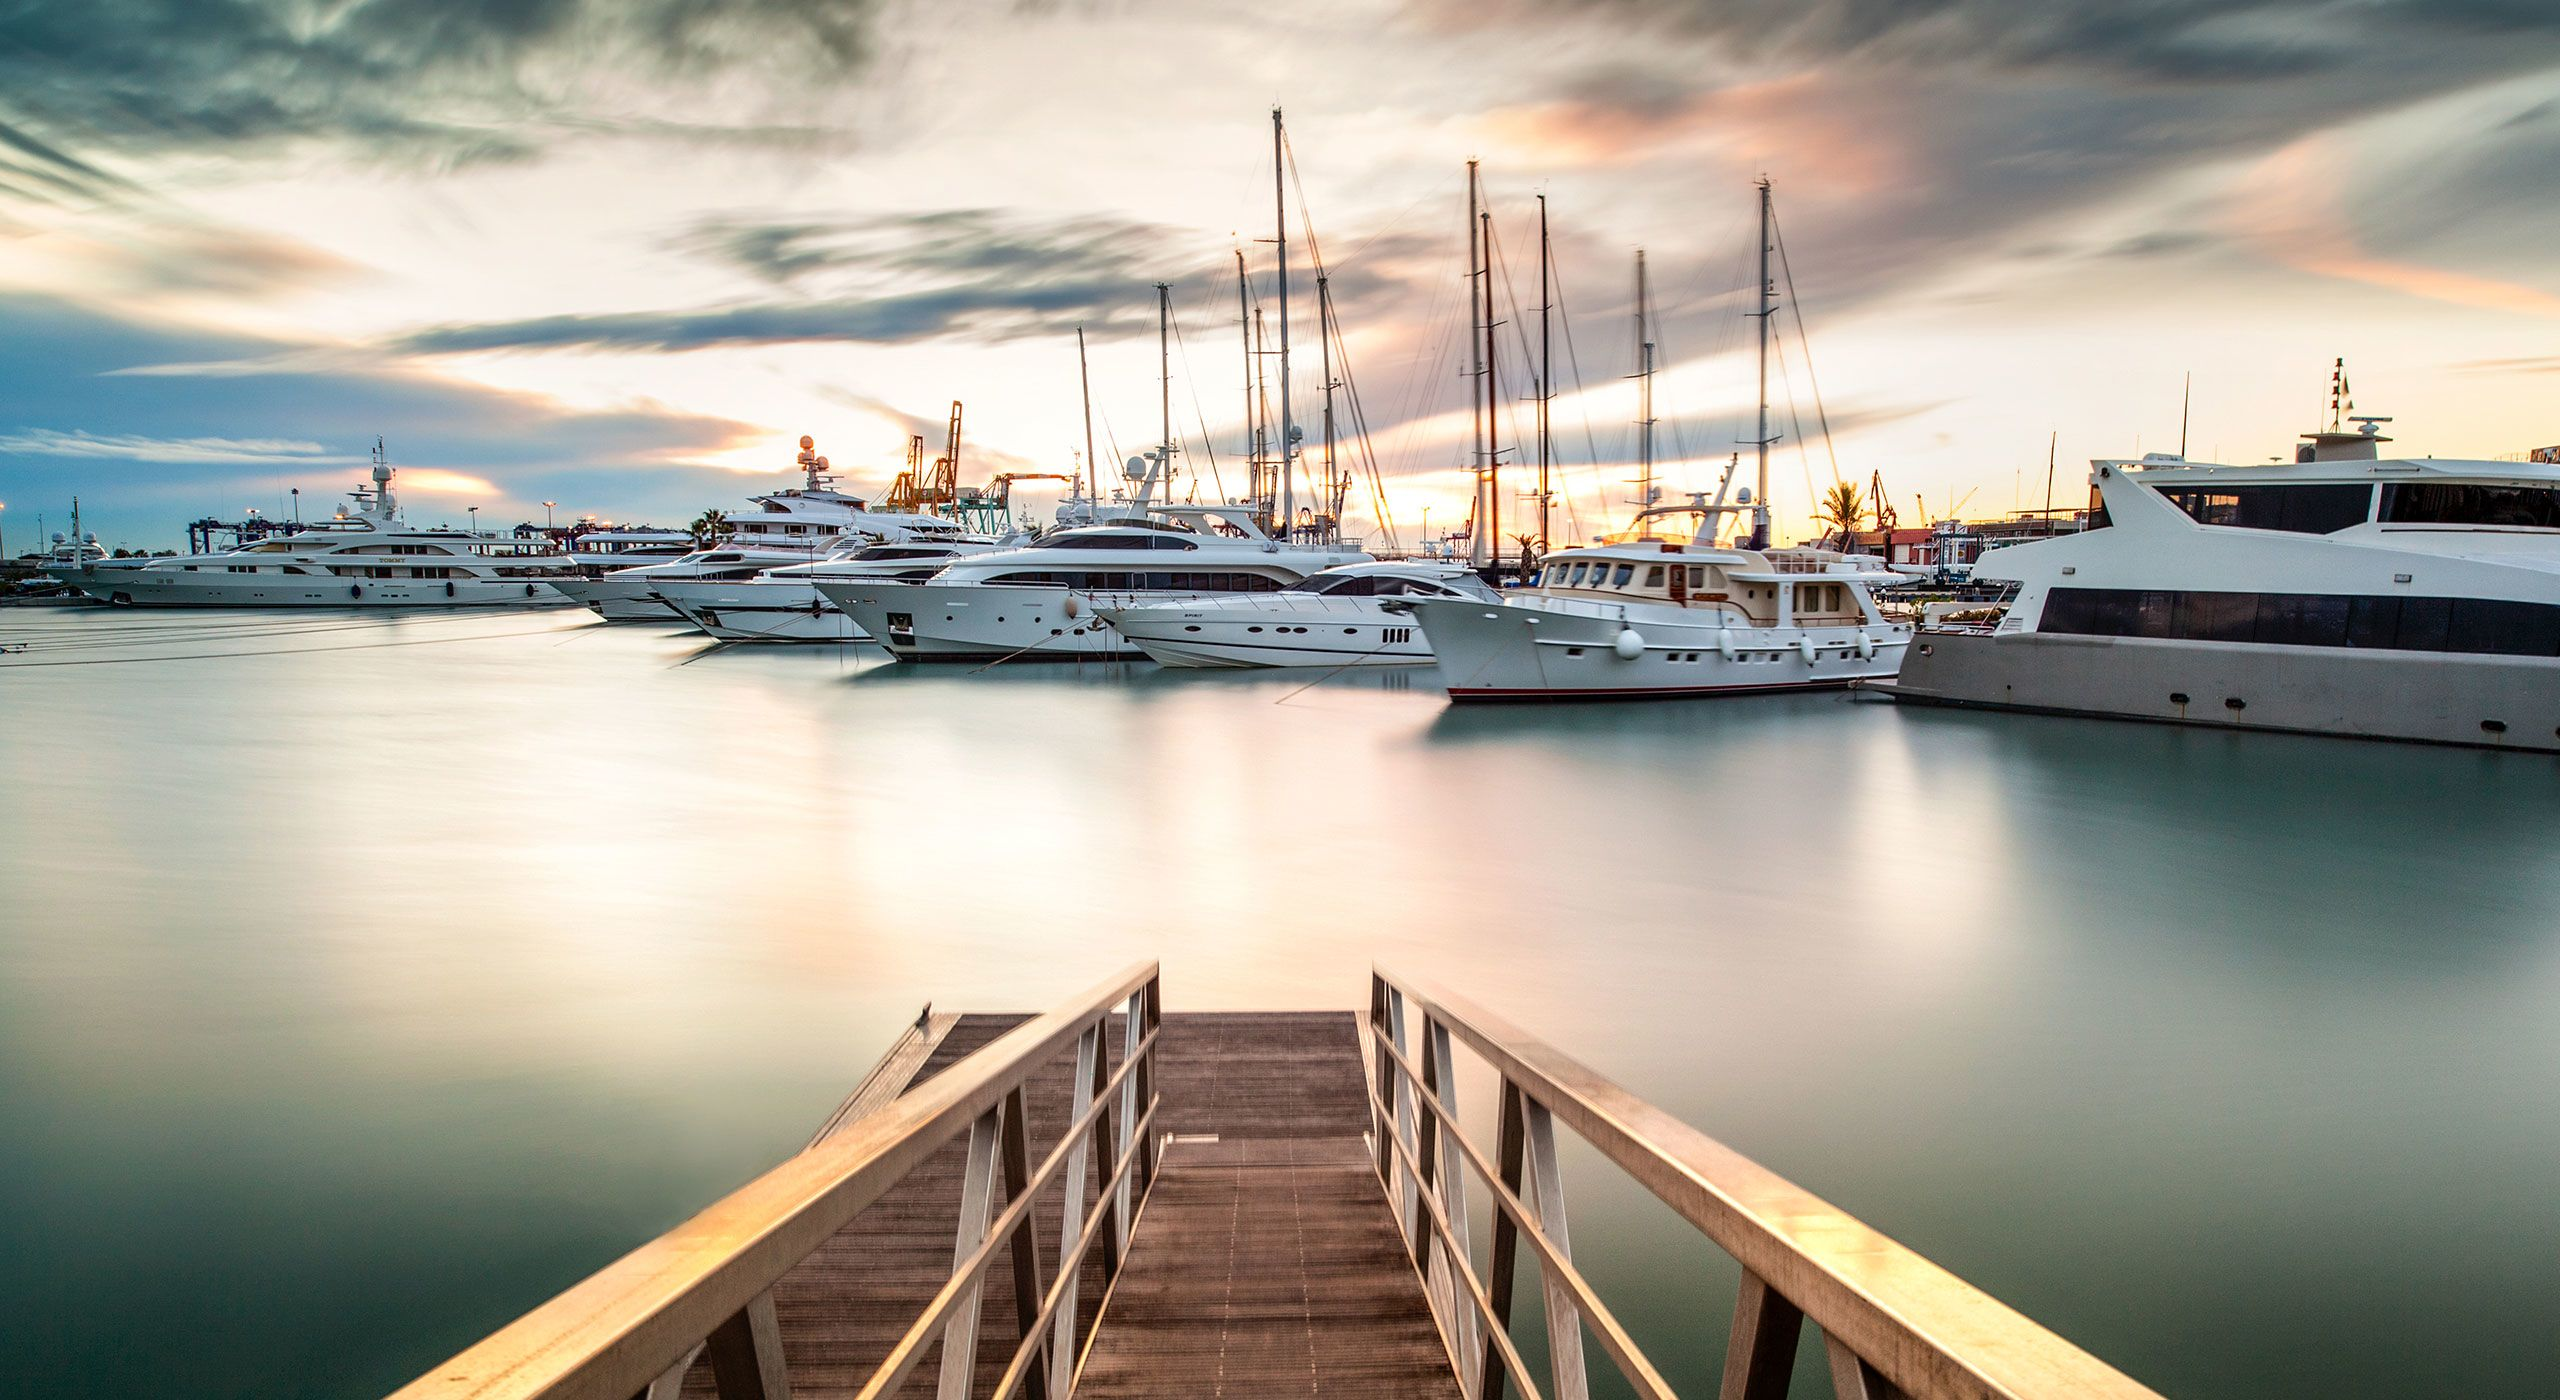 4 Under The Radar Marinas To Dock Your Yacht Across The World